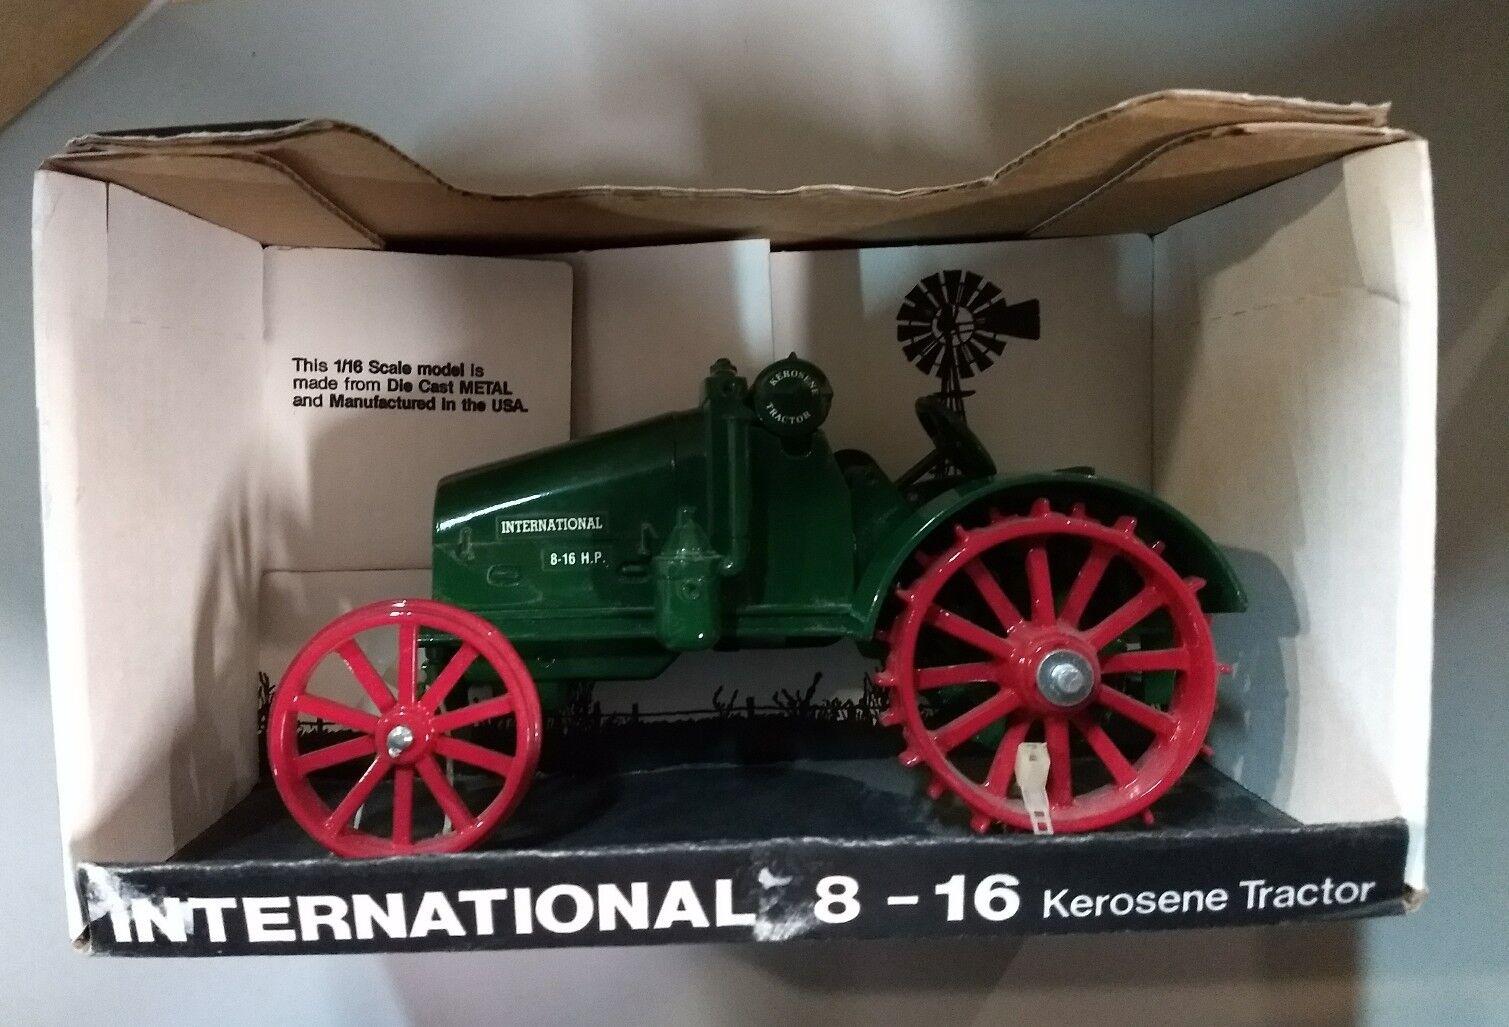 1 16 International 8-16 Kepinkne Tractor New in Box by Scale Models